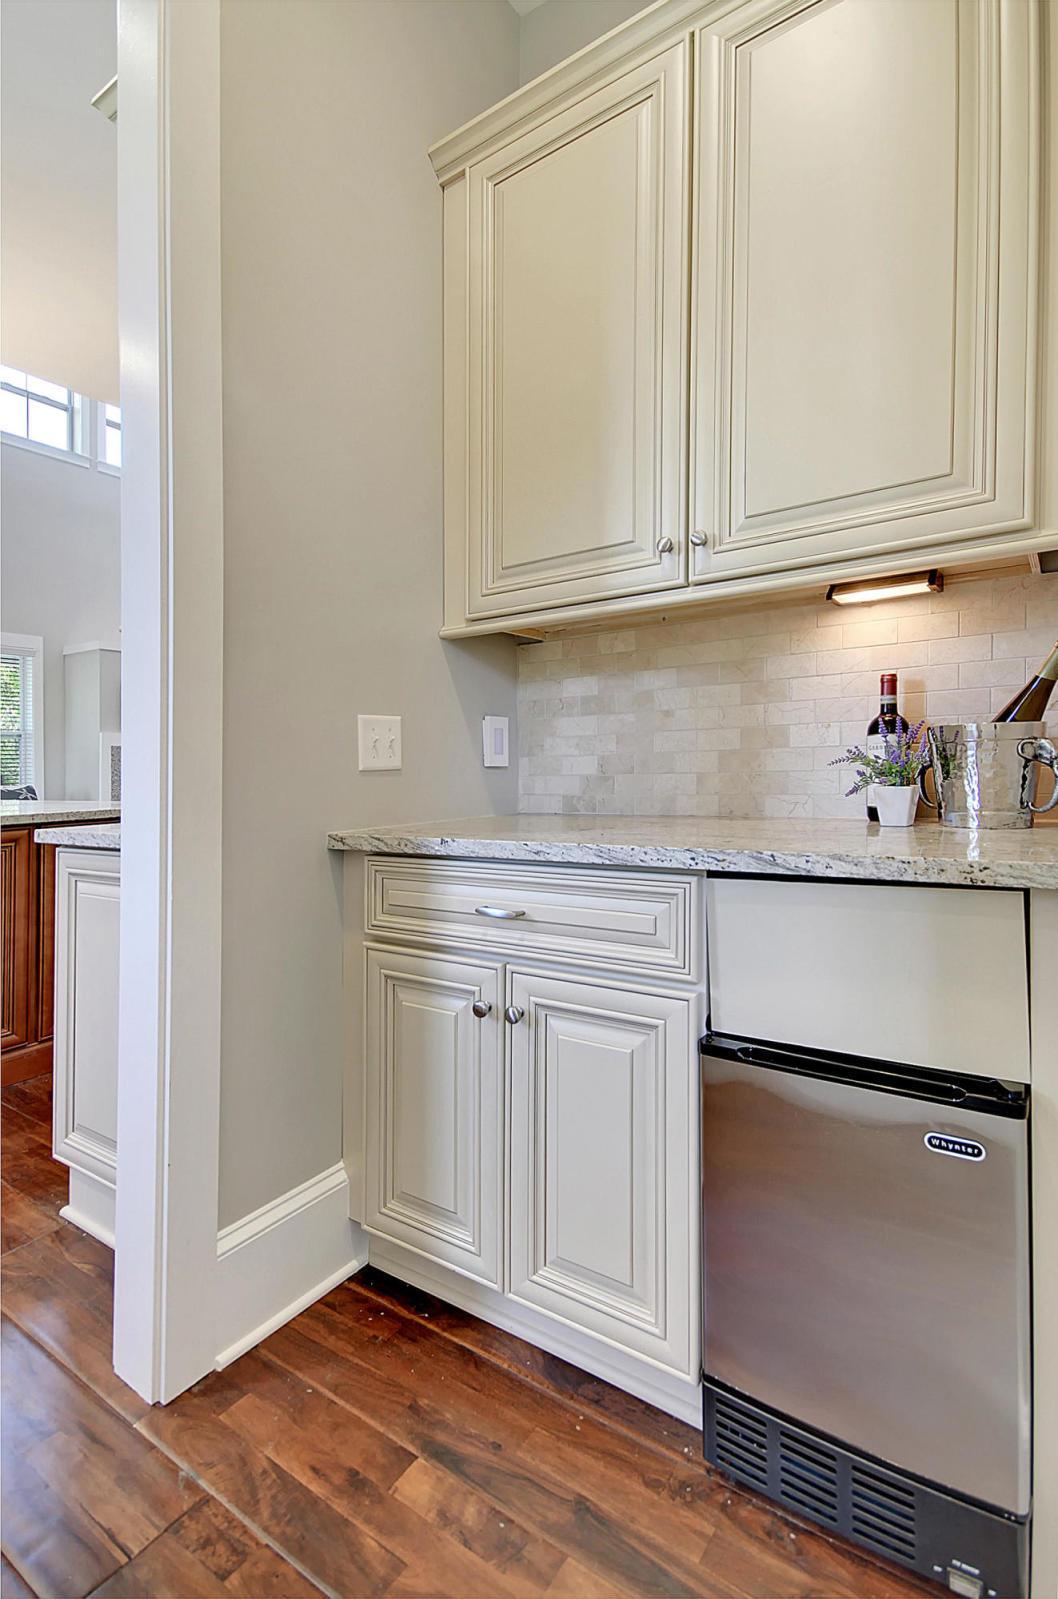 Brickyard Plantation Homes For Sale - 1440 Madison, Mount Pleasant, SC - 32